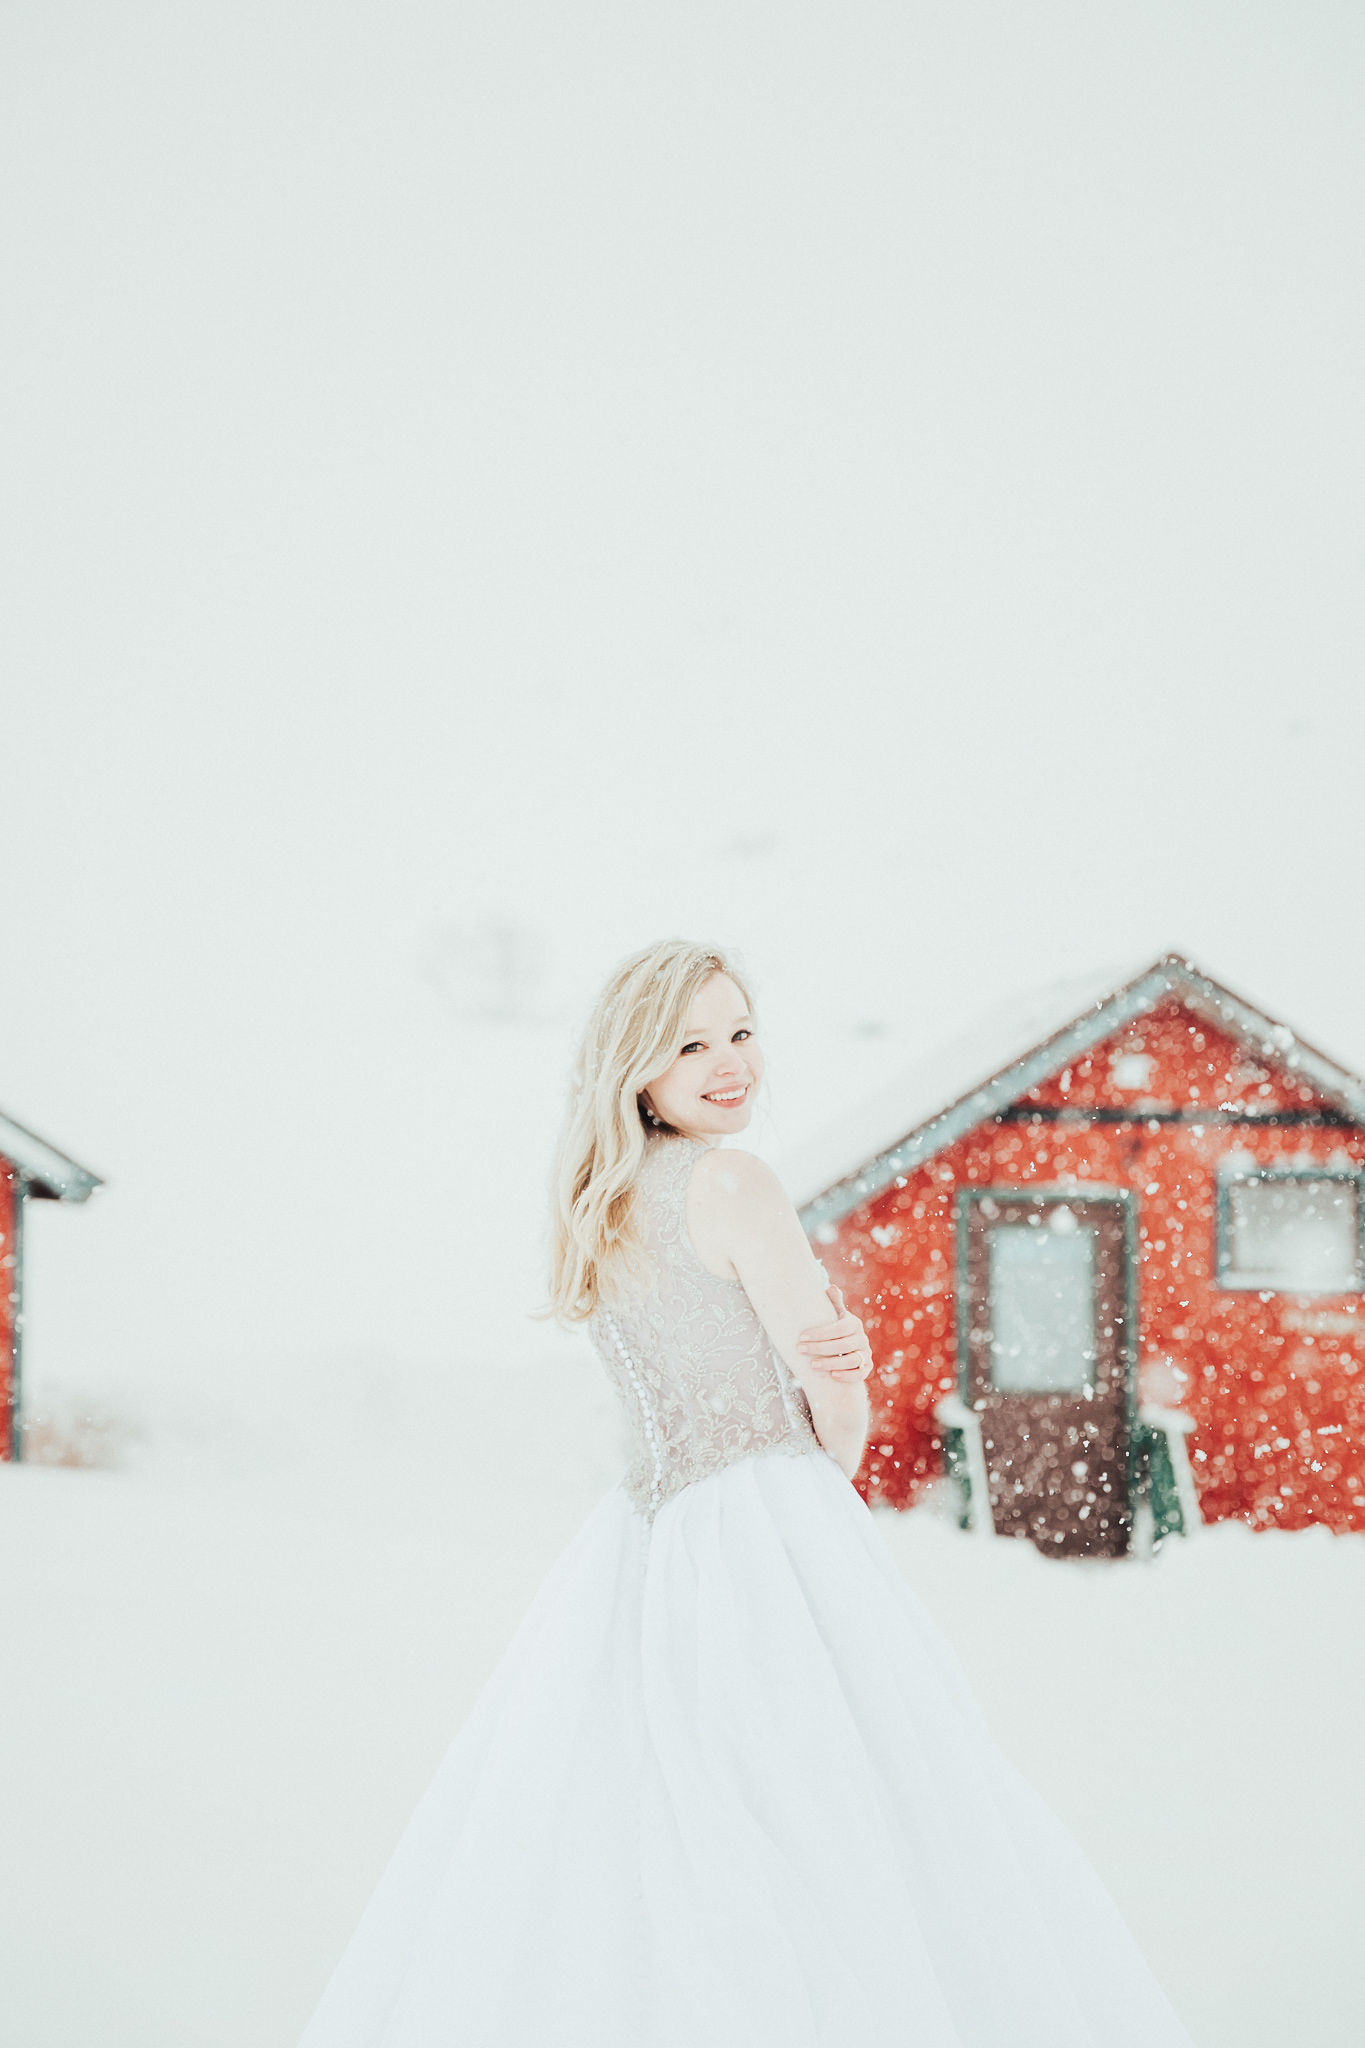 Hatcher Pass elopement Winter Wedding Anderson's Bride Wedding Gown